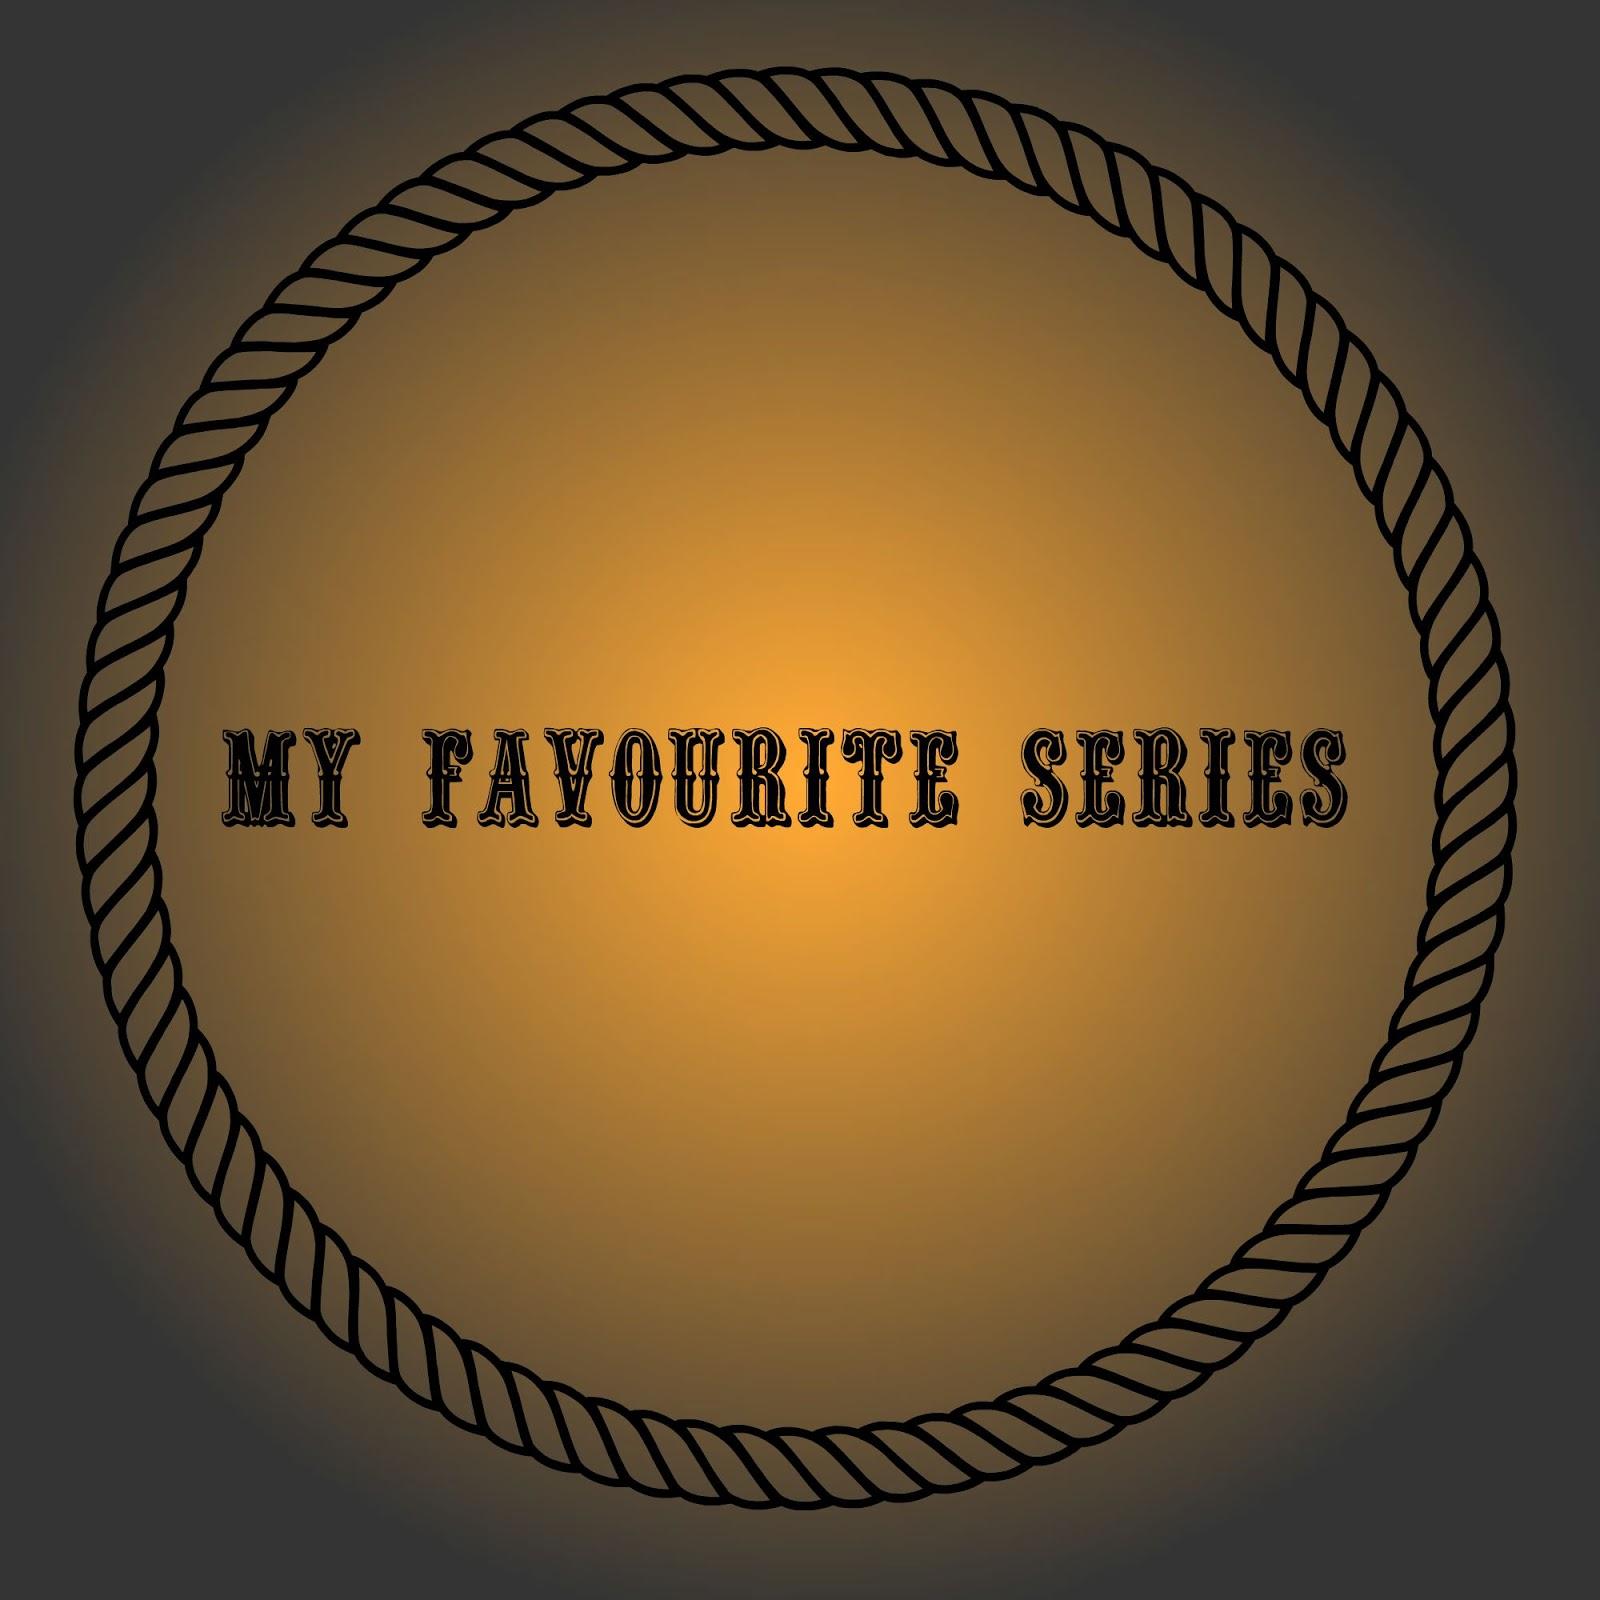 Favourite series